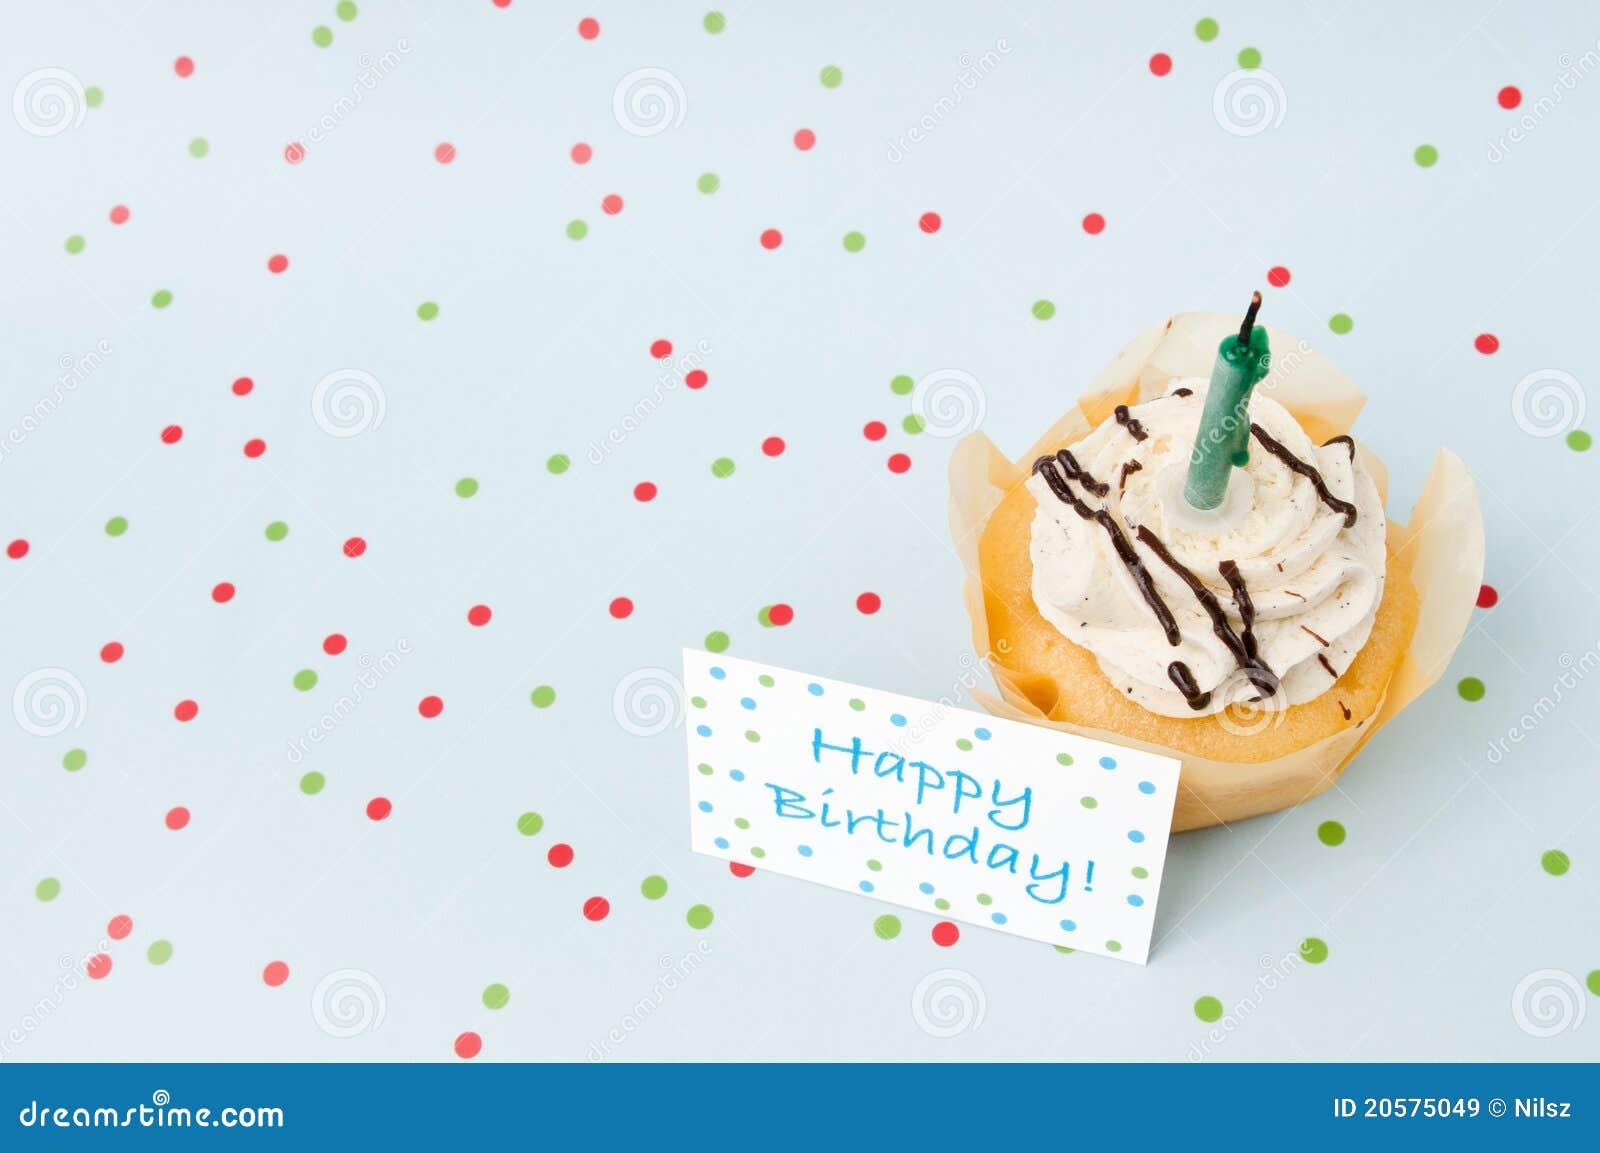 Small happy birthday cake